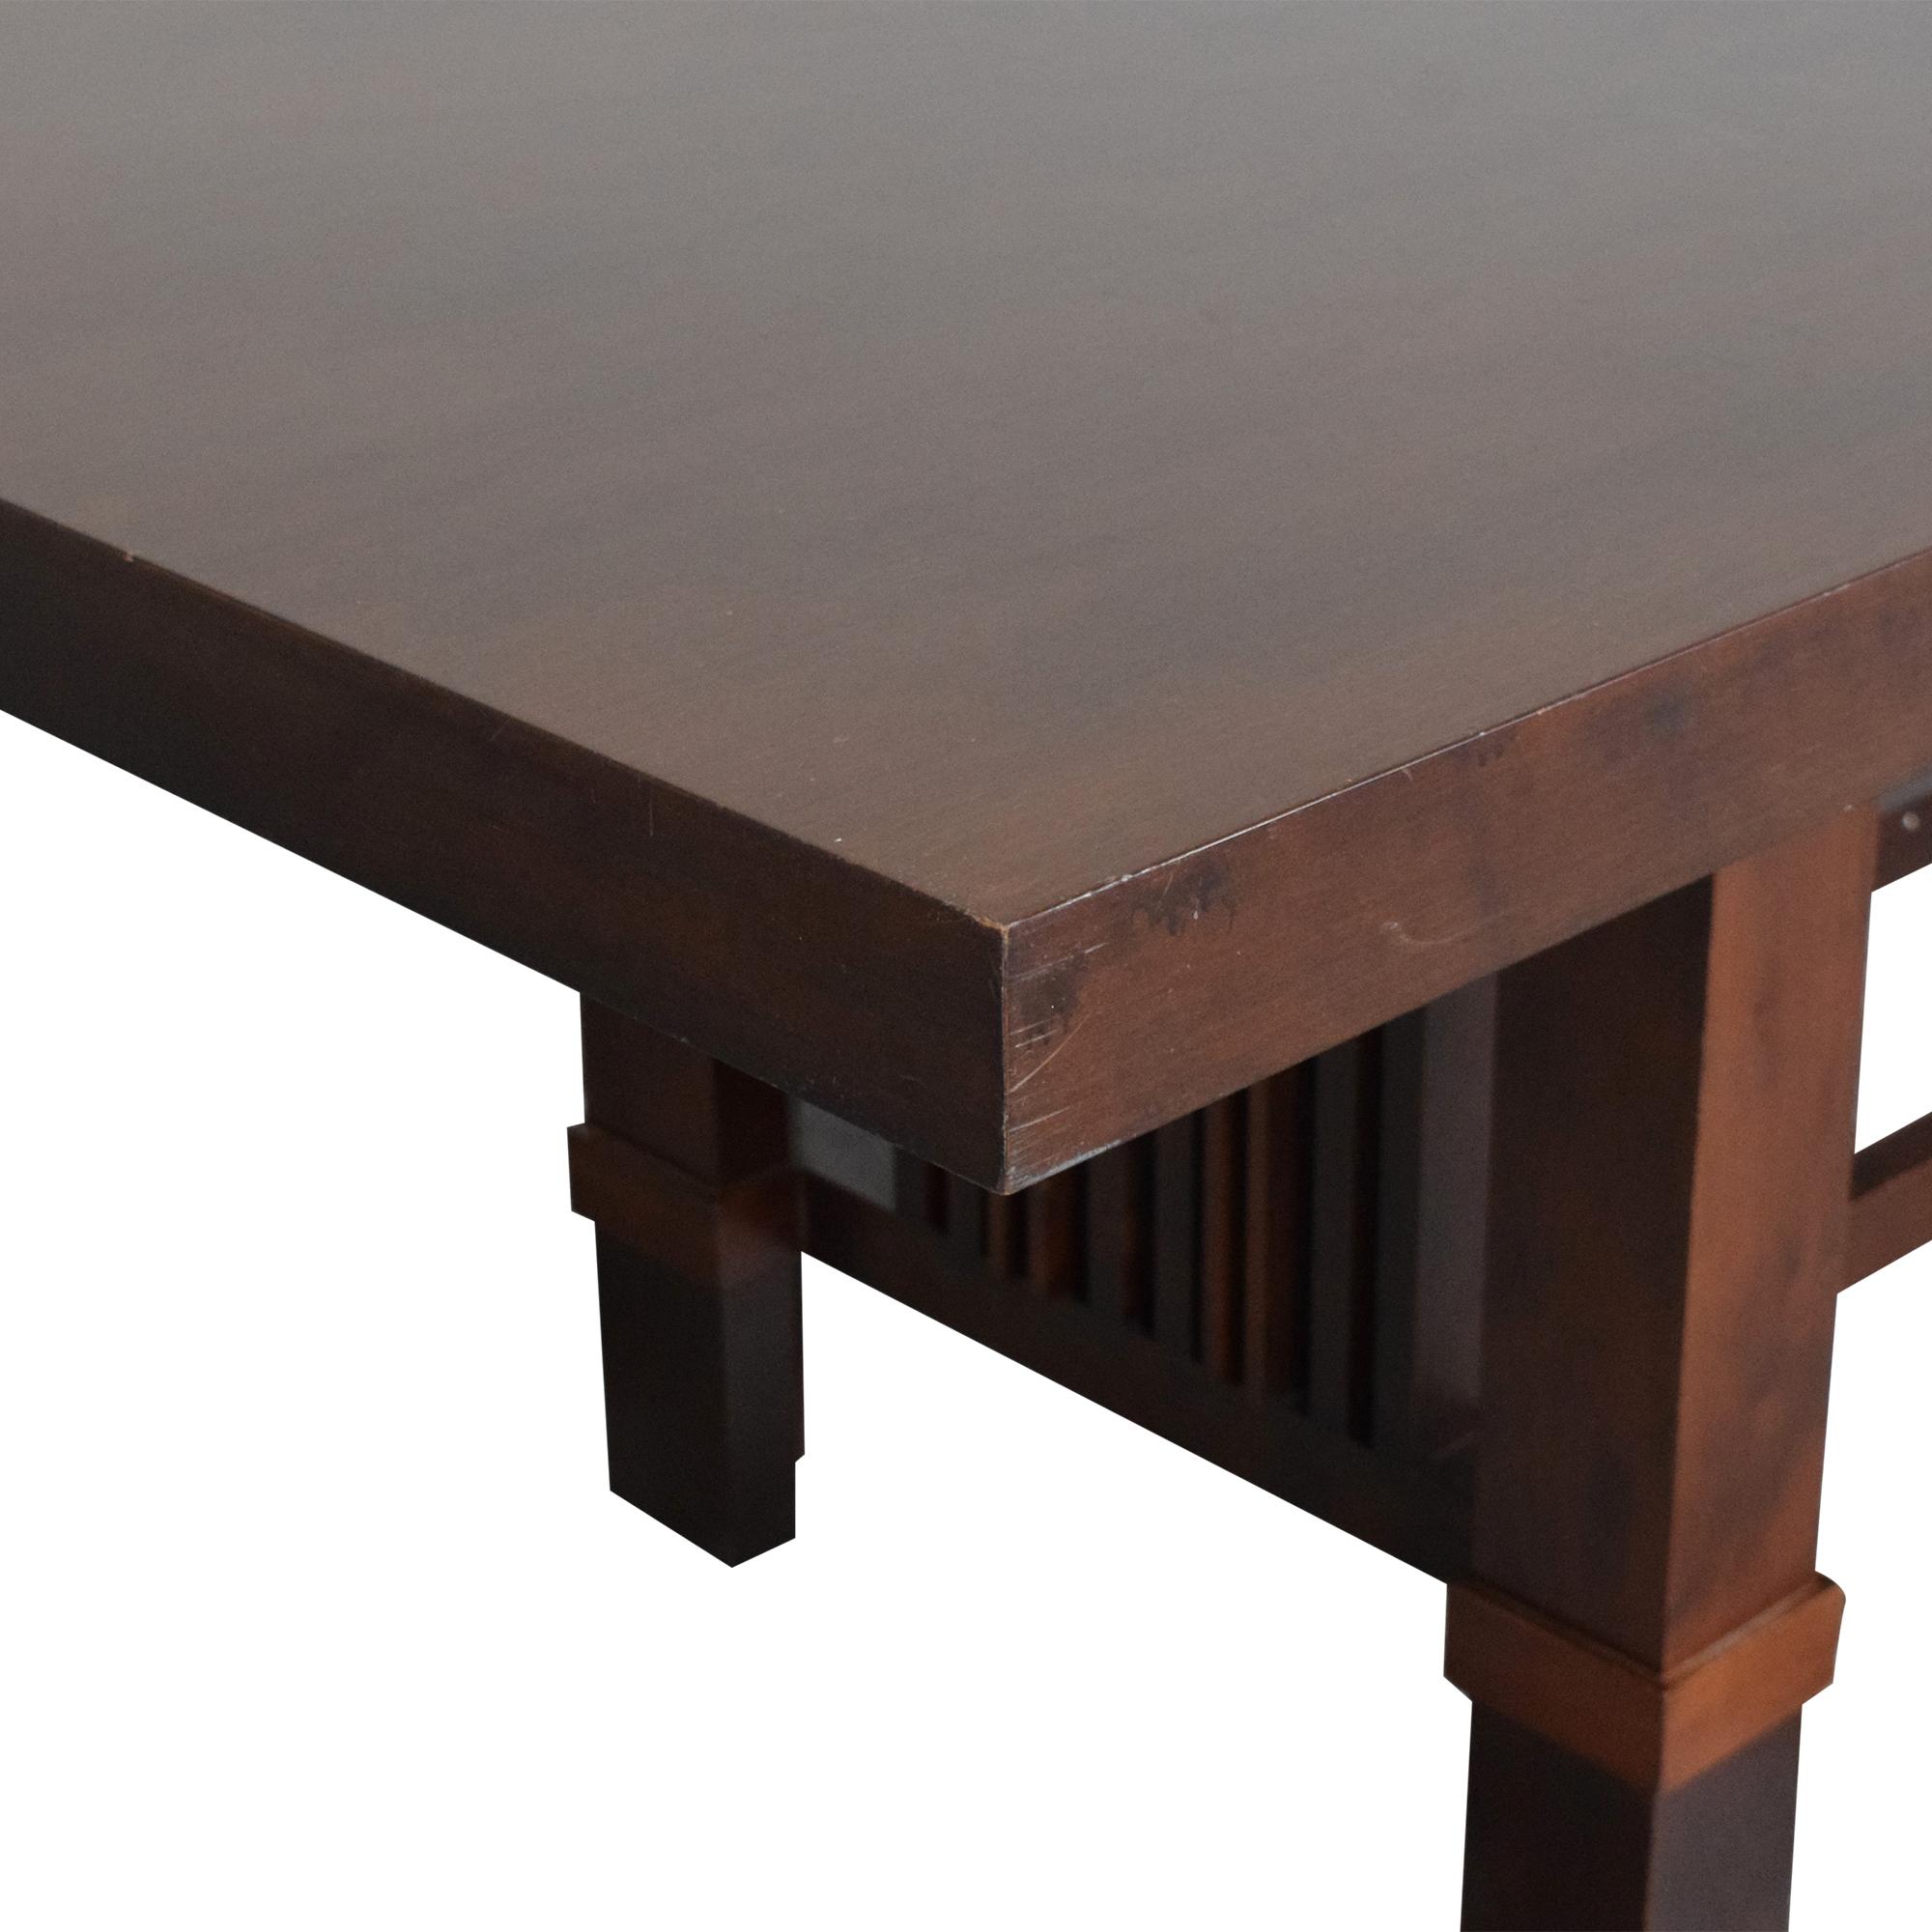 Cassina Cassina Frank Lloyd Wright Taliesin Dining Table on sale